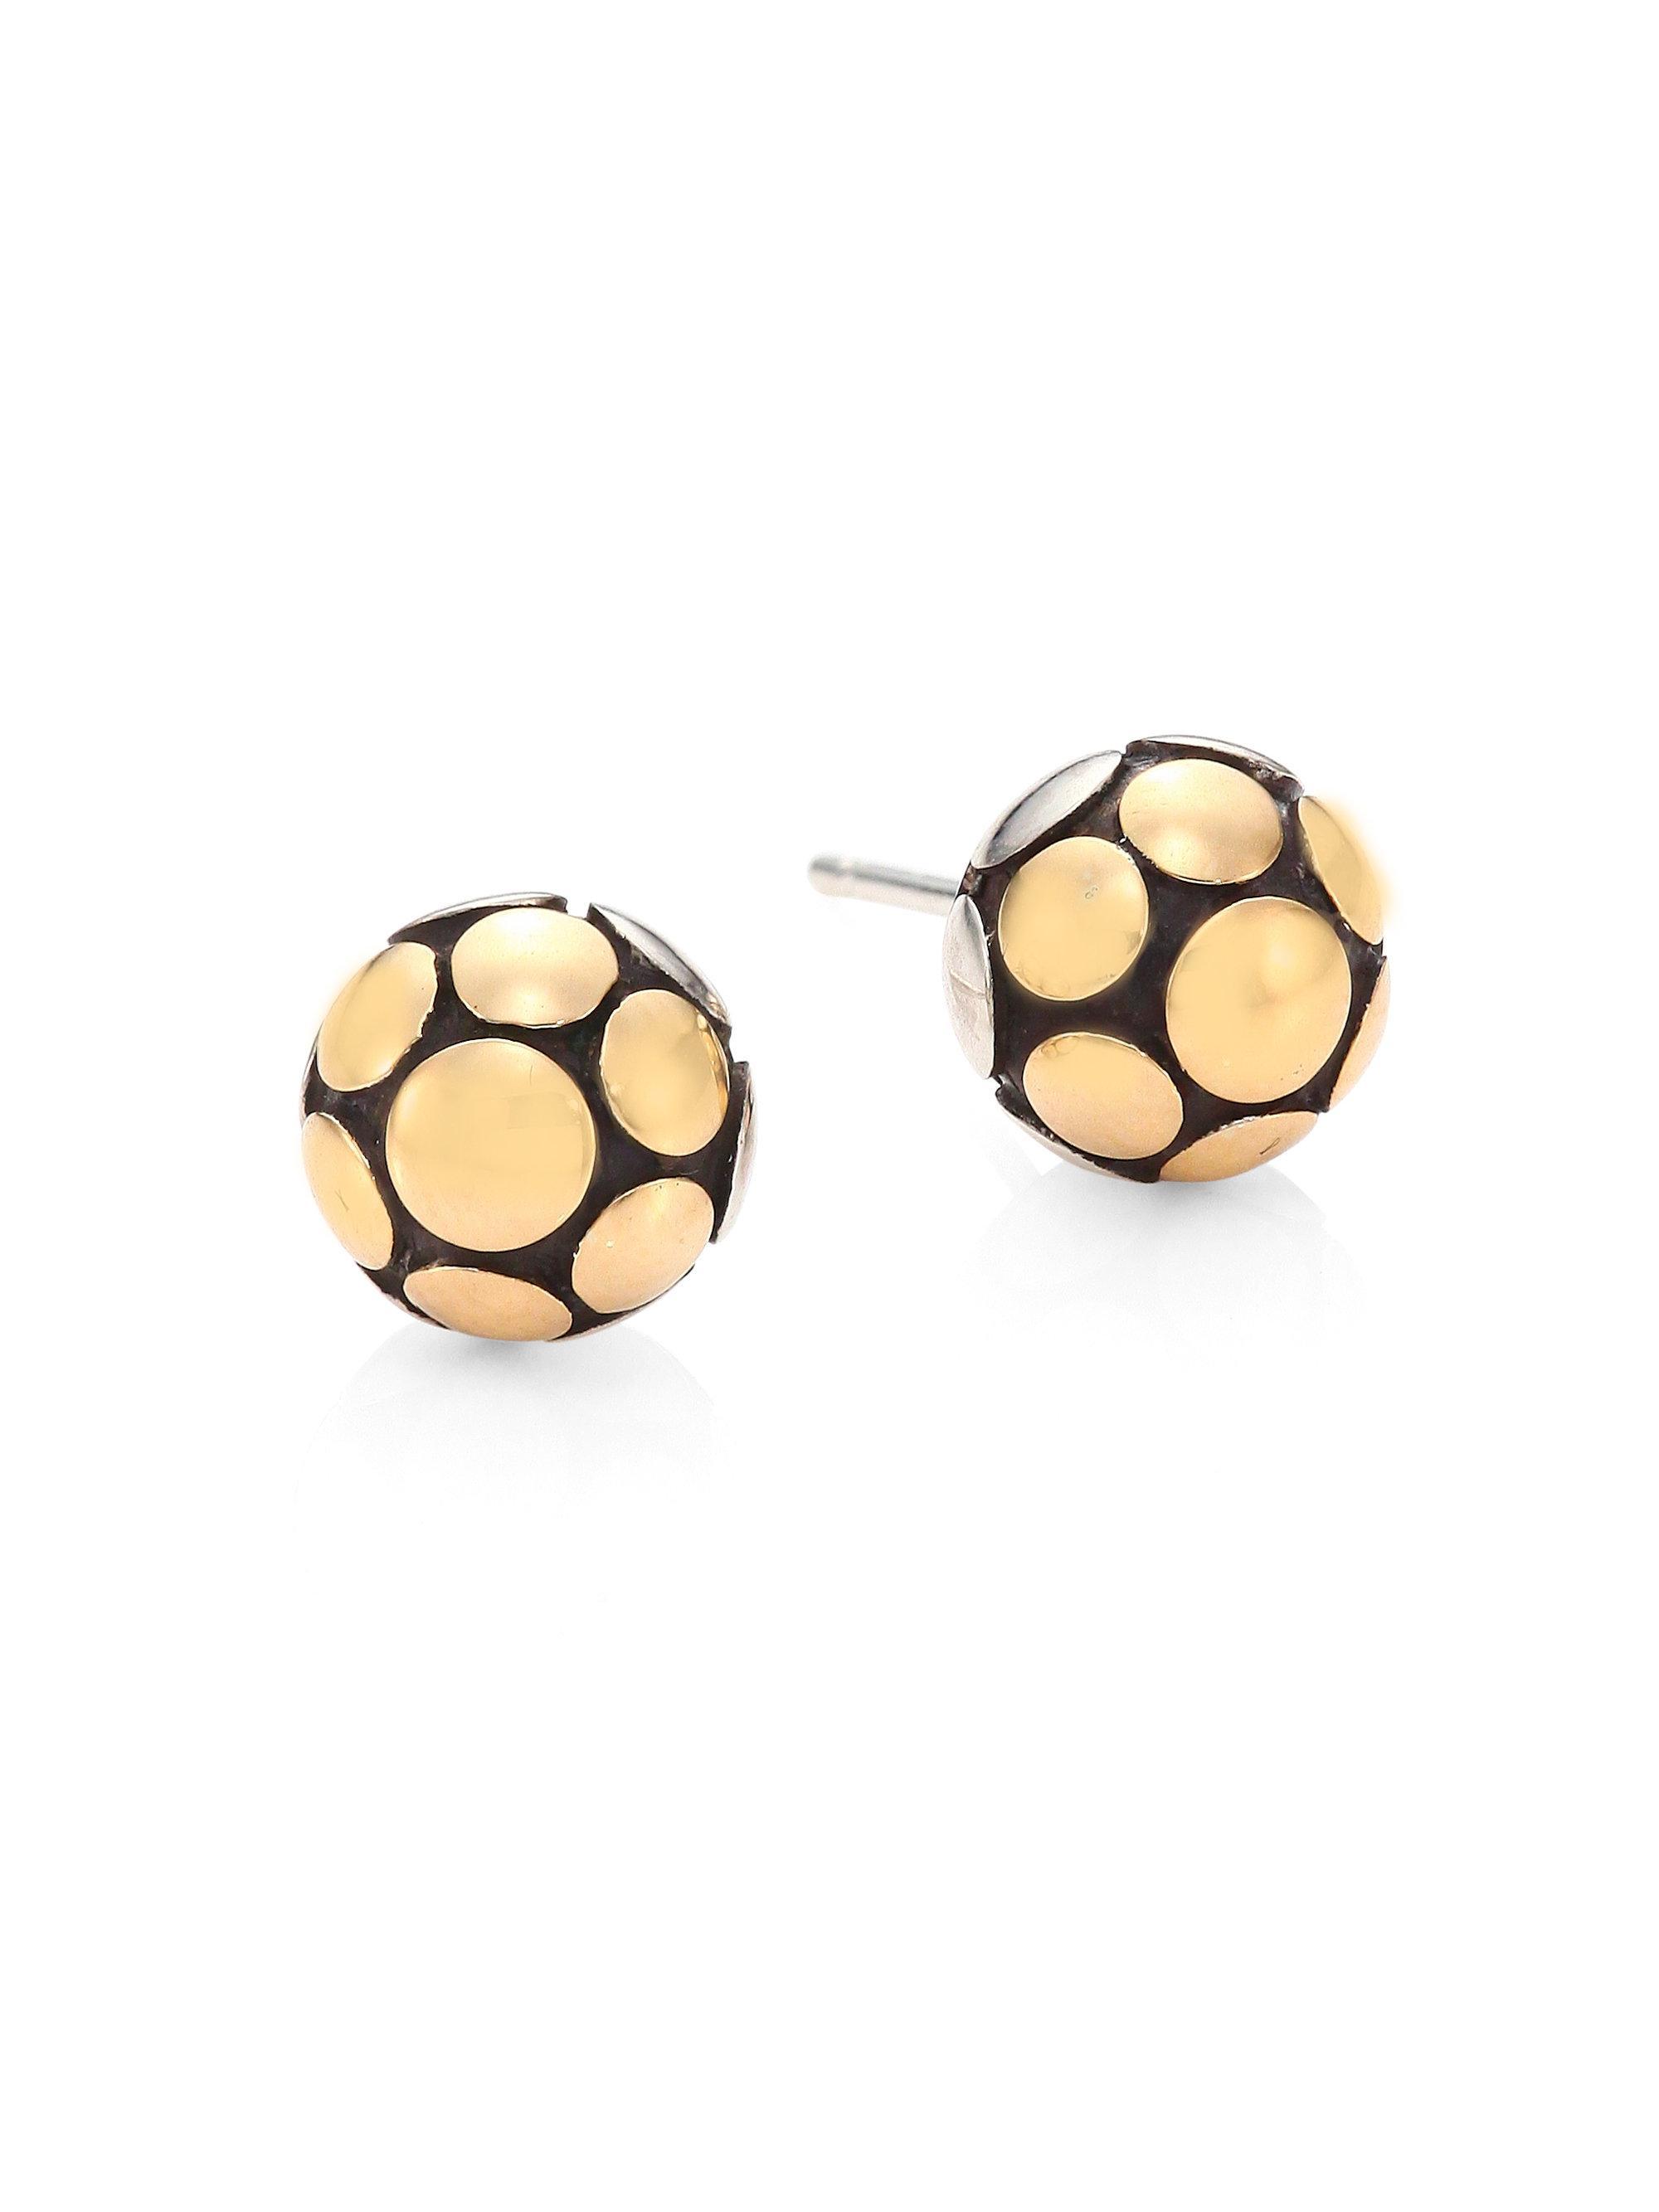 John Hardy Women S Metallic Dot Medium 18k Yellow Gold Sterling Silver Ball Stud Earrings